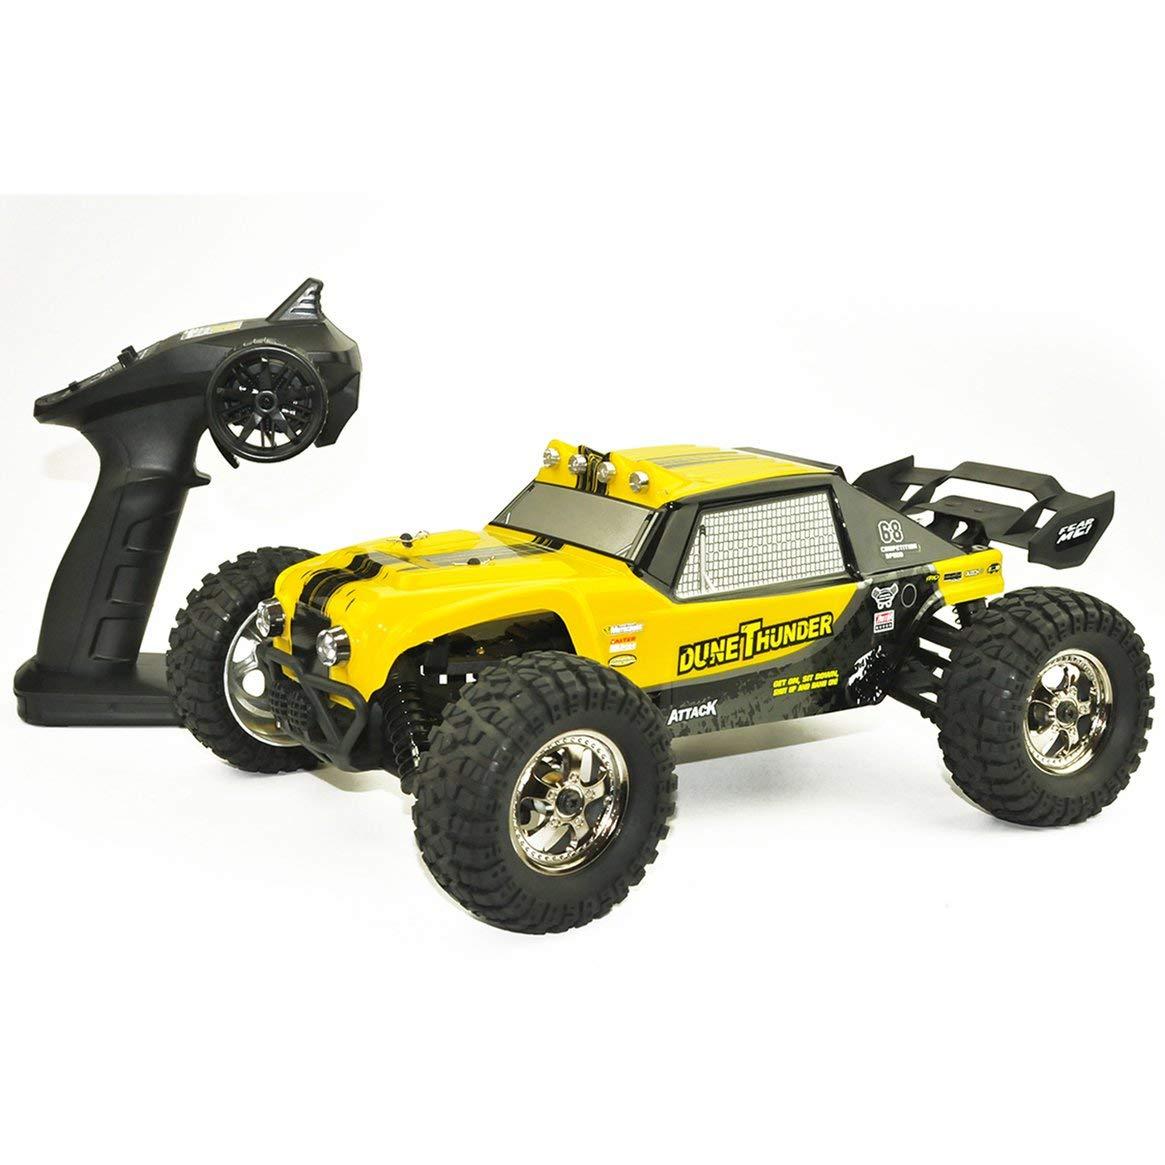 Delicacydex HBX 12891 Thruster 1:12 2.4GHz 4WD Drift Desert Off-Road de Alta Velocidad Racing Car Climber RC Juguete del Coche para niños Amarillo Amarillo